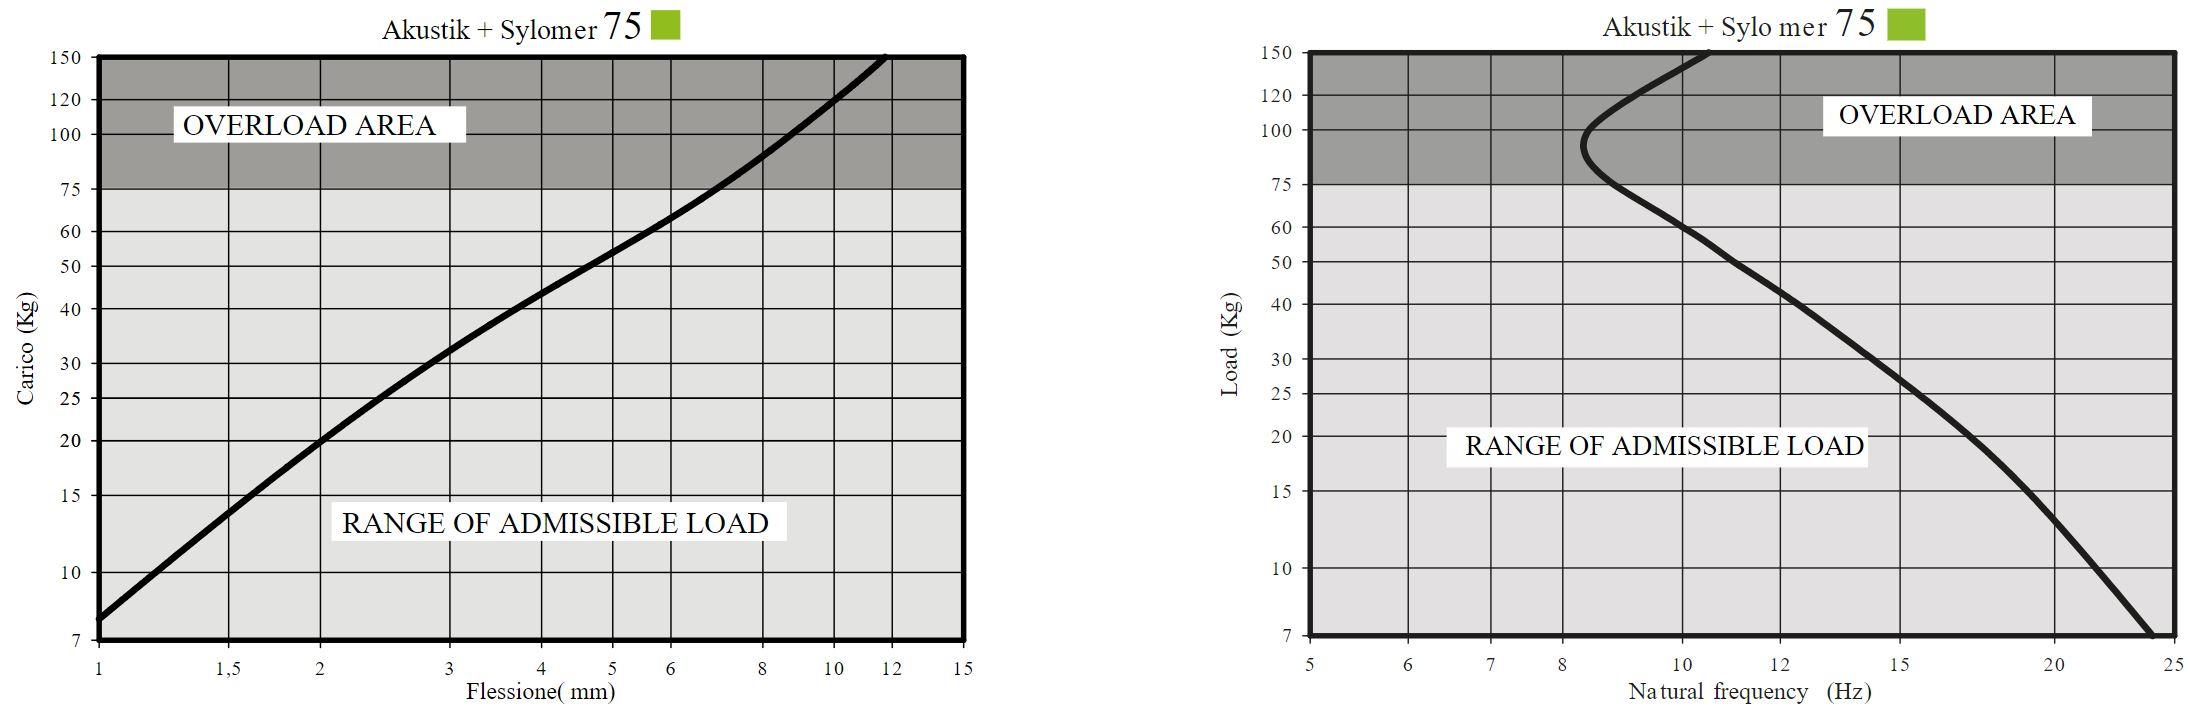 Akustik Lateral + Sylomer Curve 2